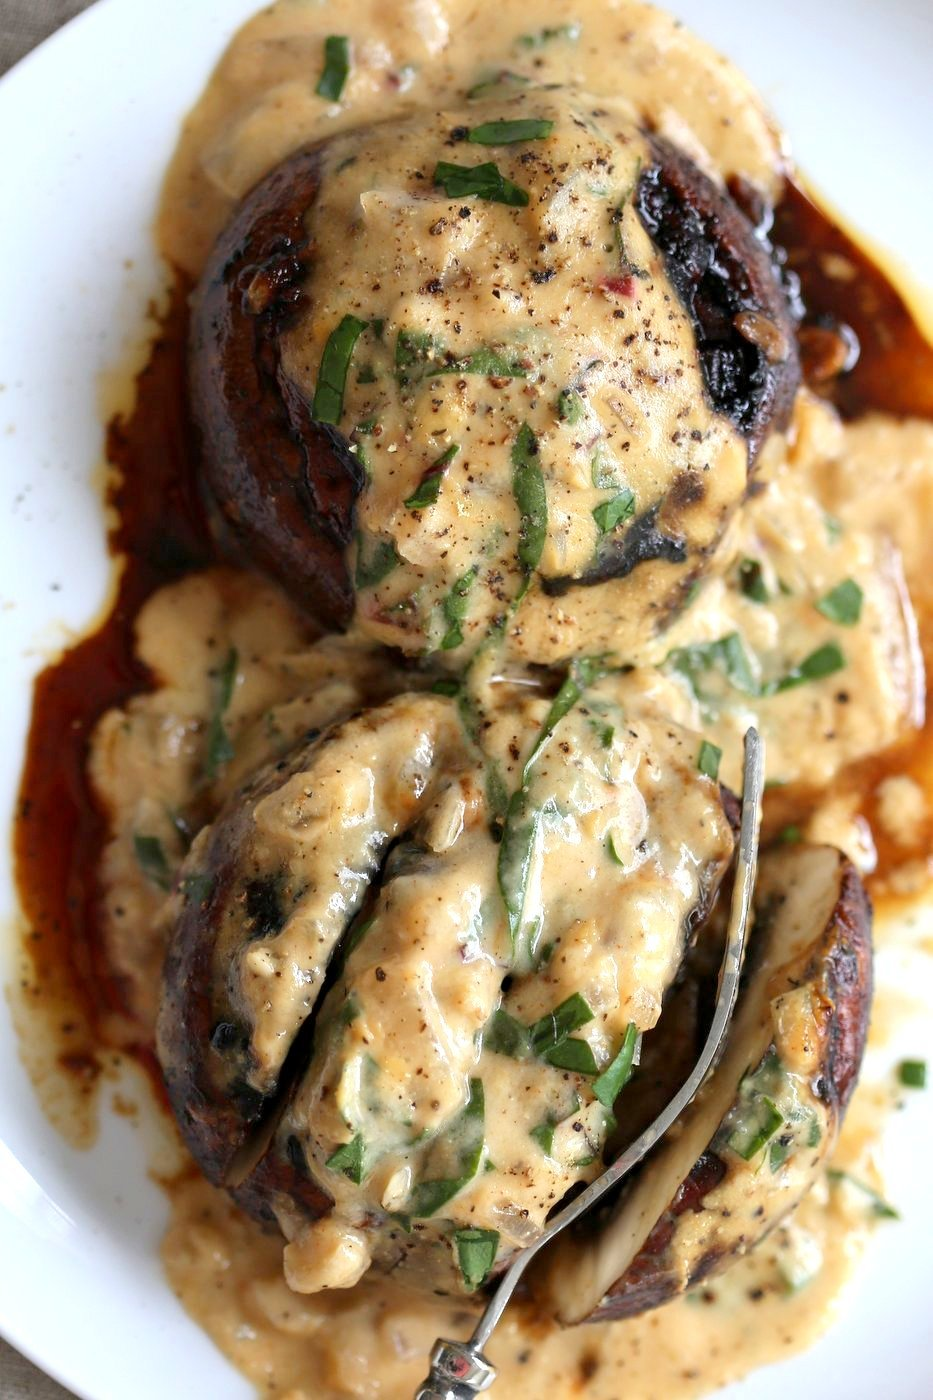 Grilled Portobello Mushrooms with Garlic Sauce - Vegan Richa